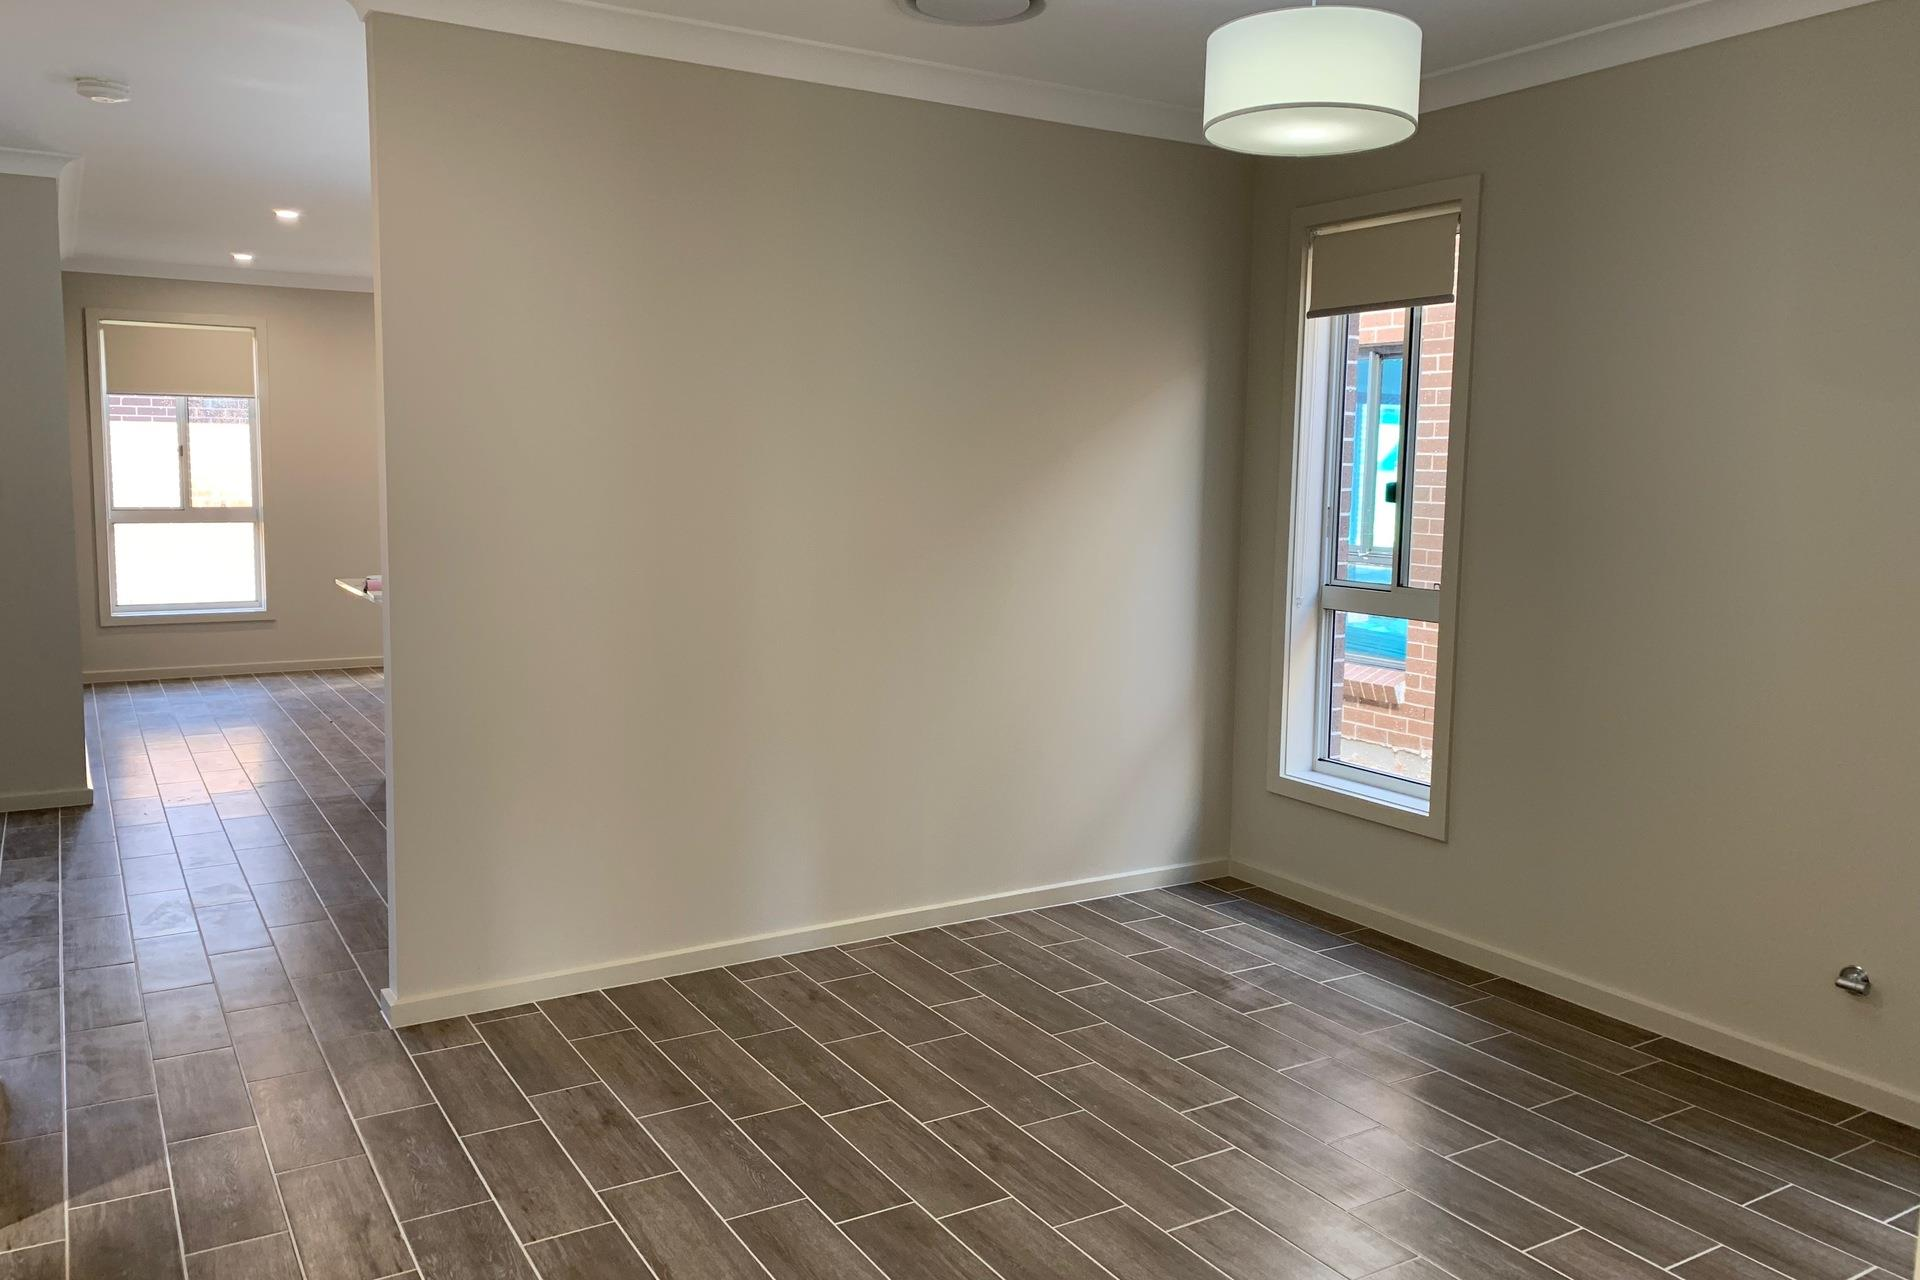 125 Macdonald Rd, Bardia, NSW 2565